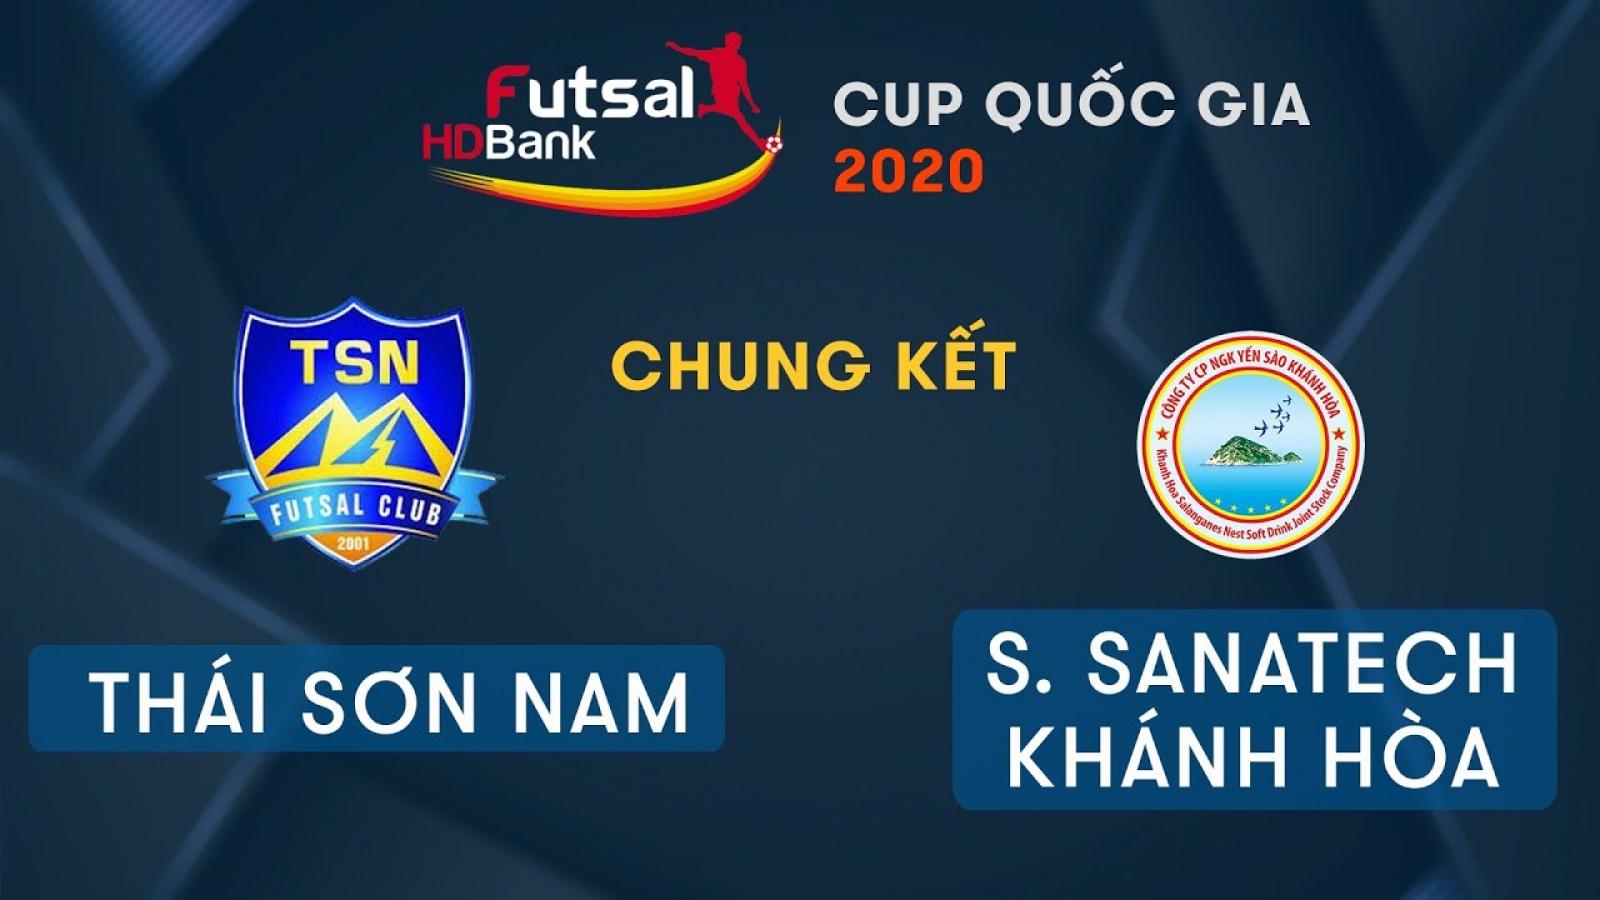 TRỰC TIẾP Thái Sơn Nam vs Sanvinest Sanatech Khánh Hòa